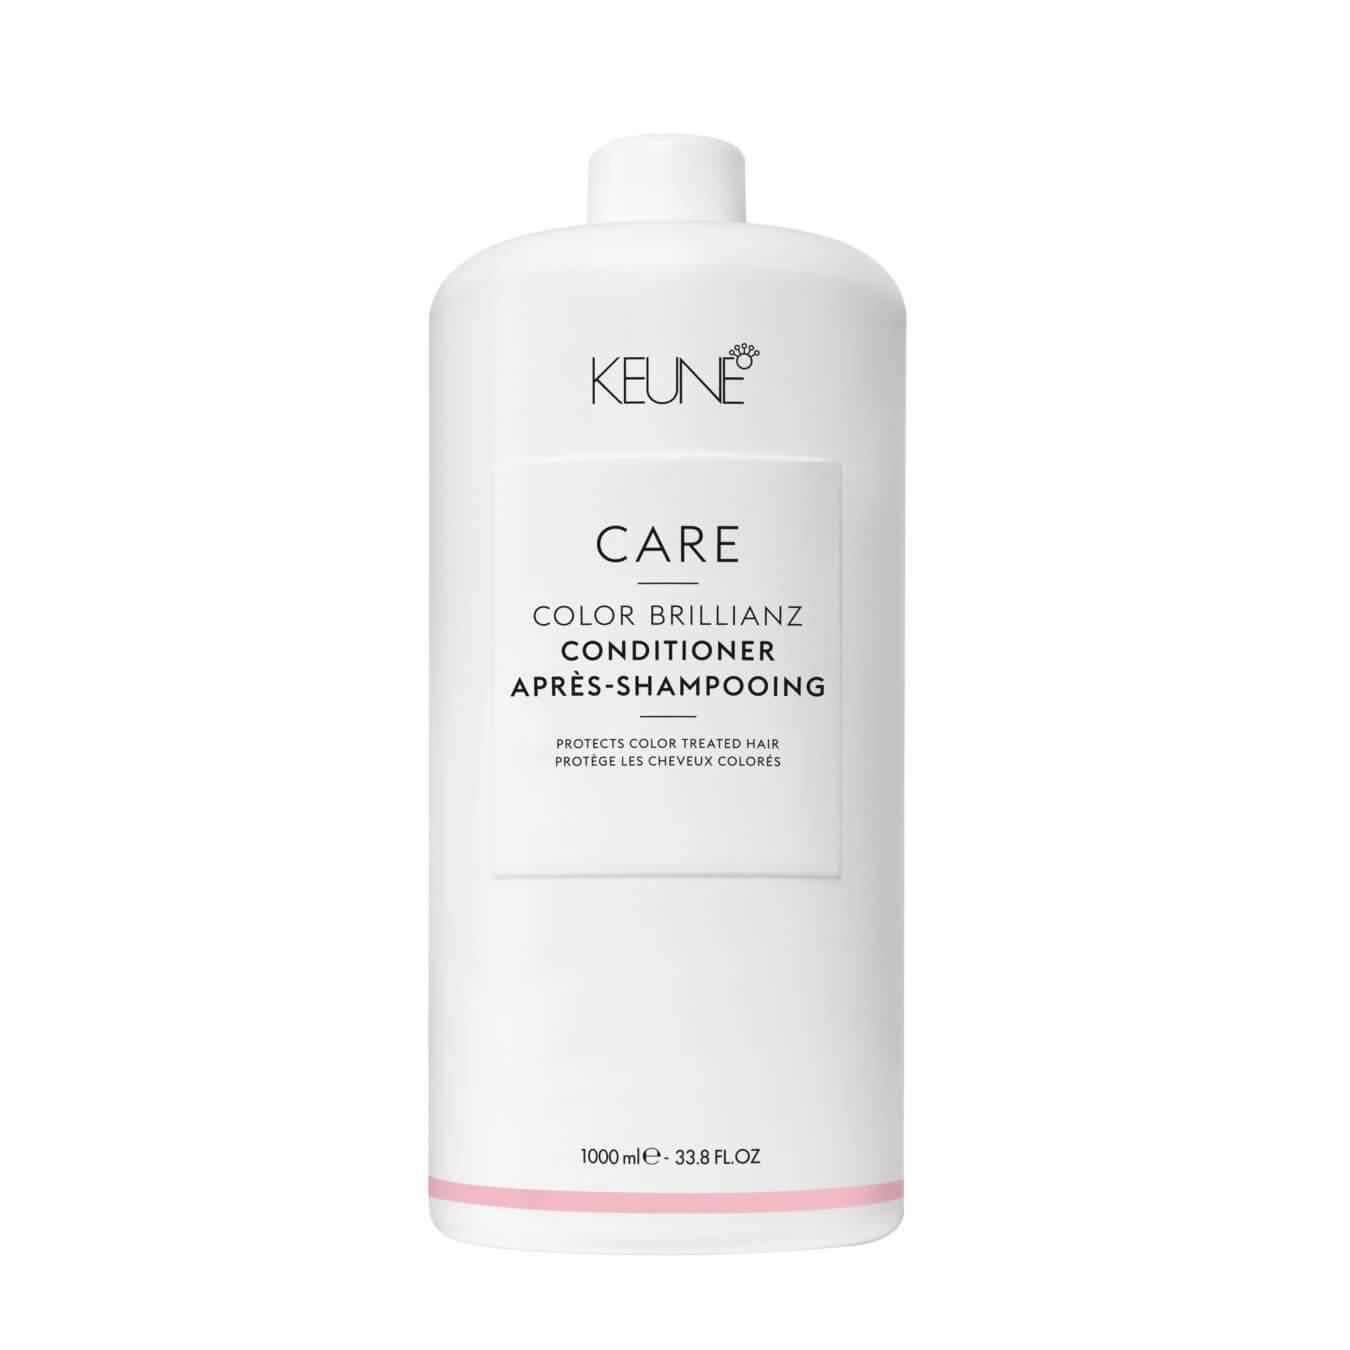 Kauf Keune Care Color Brillianz Conditioner 1000ml